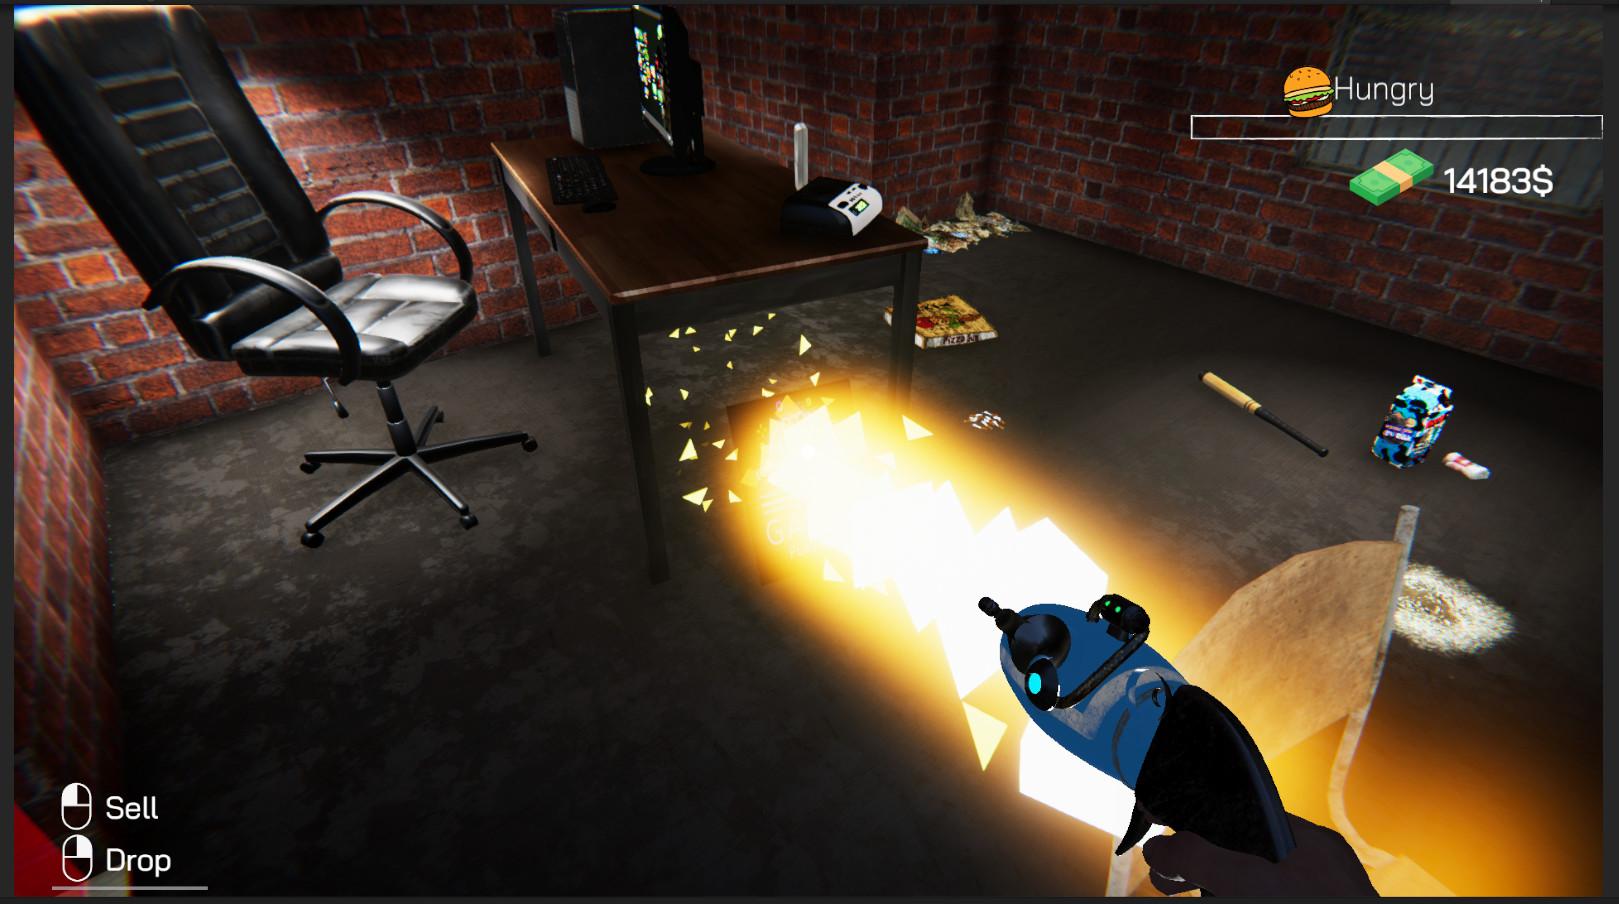 heta dating simulering spel online